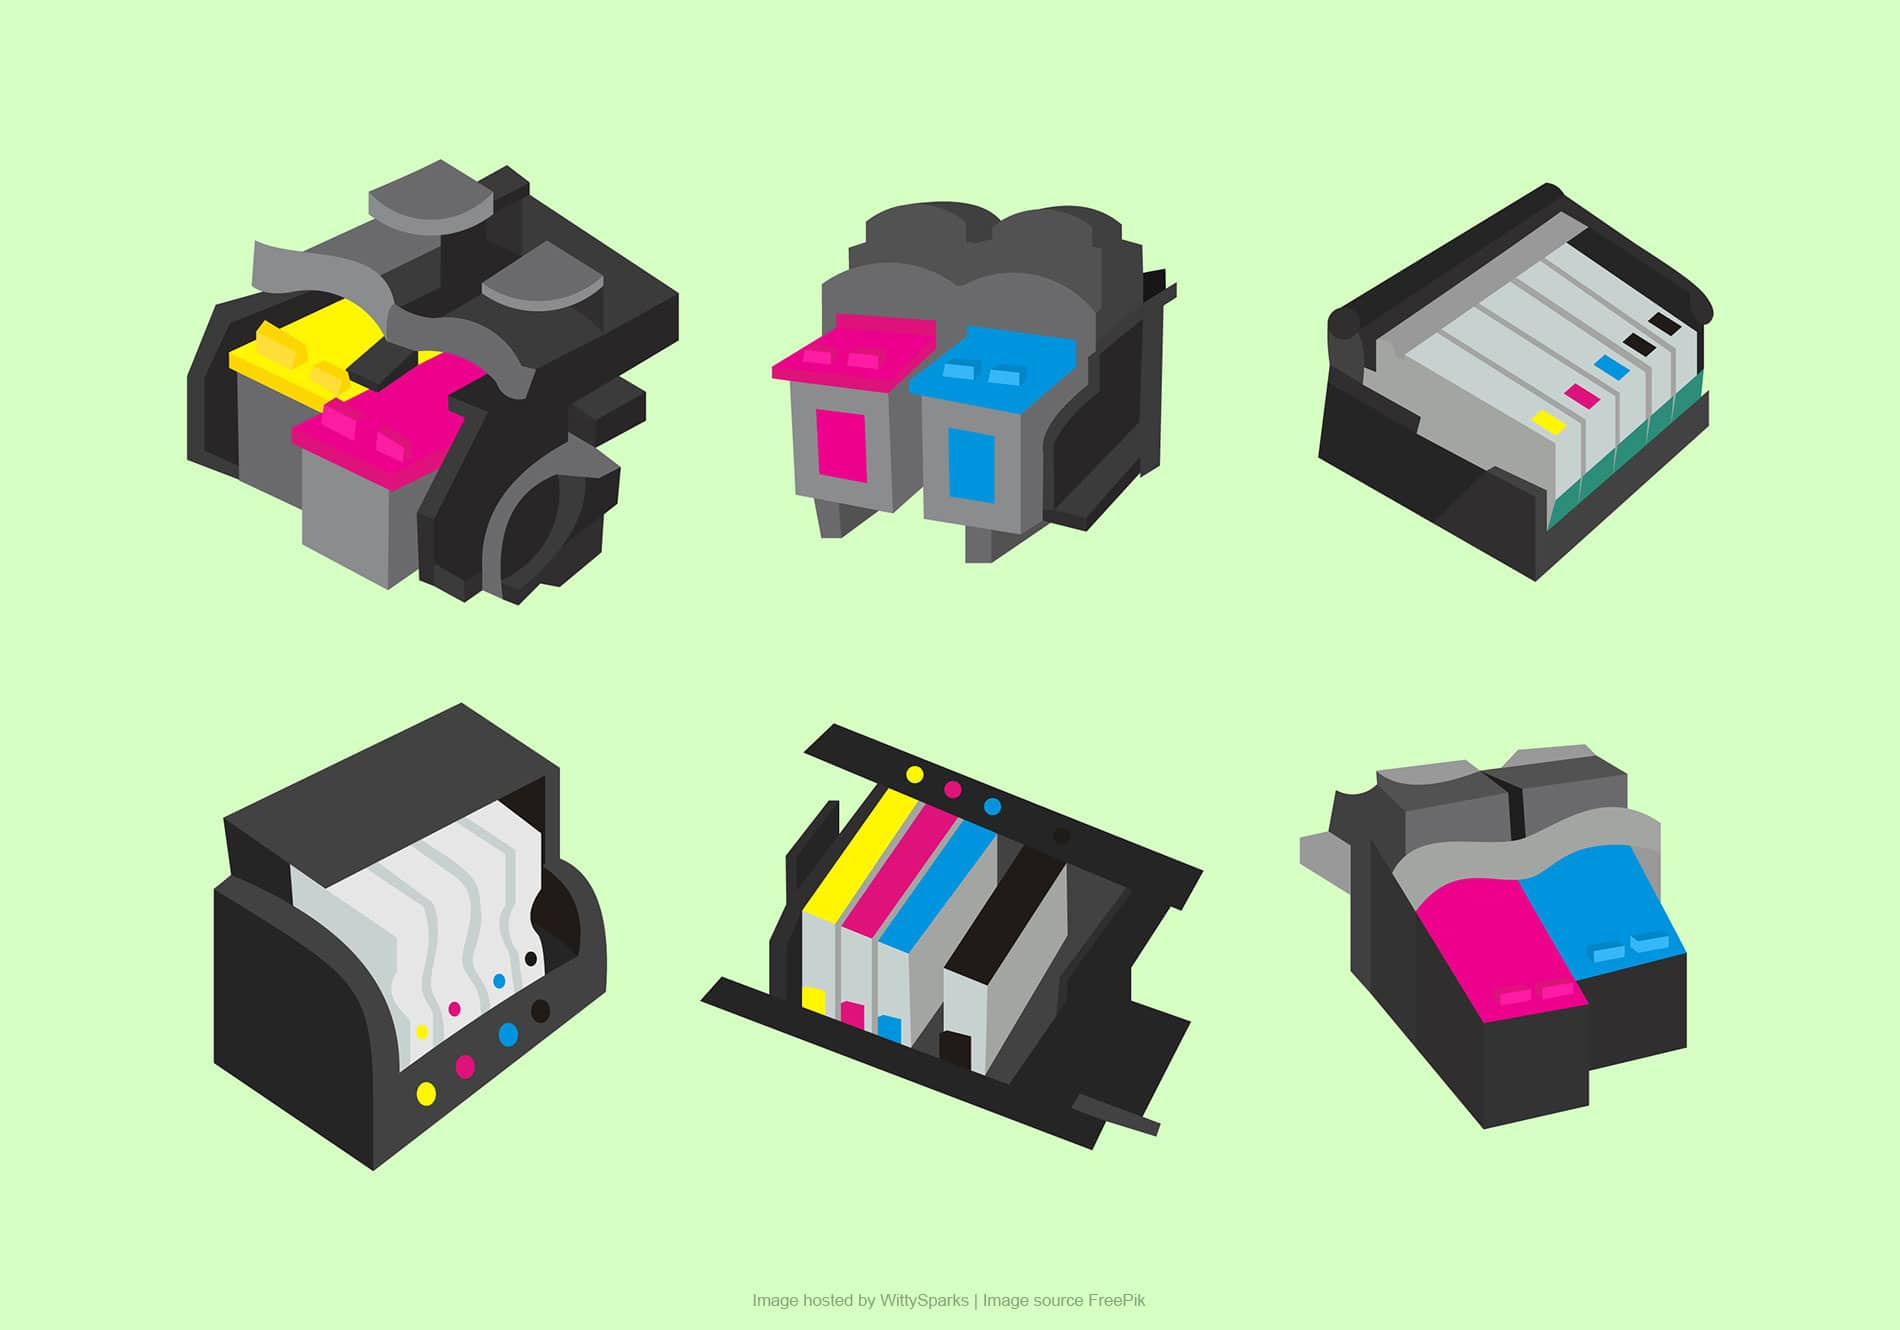 Types of ink cartridges